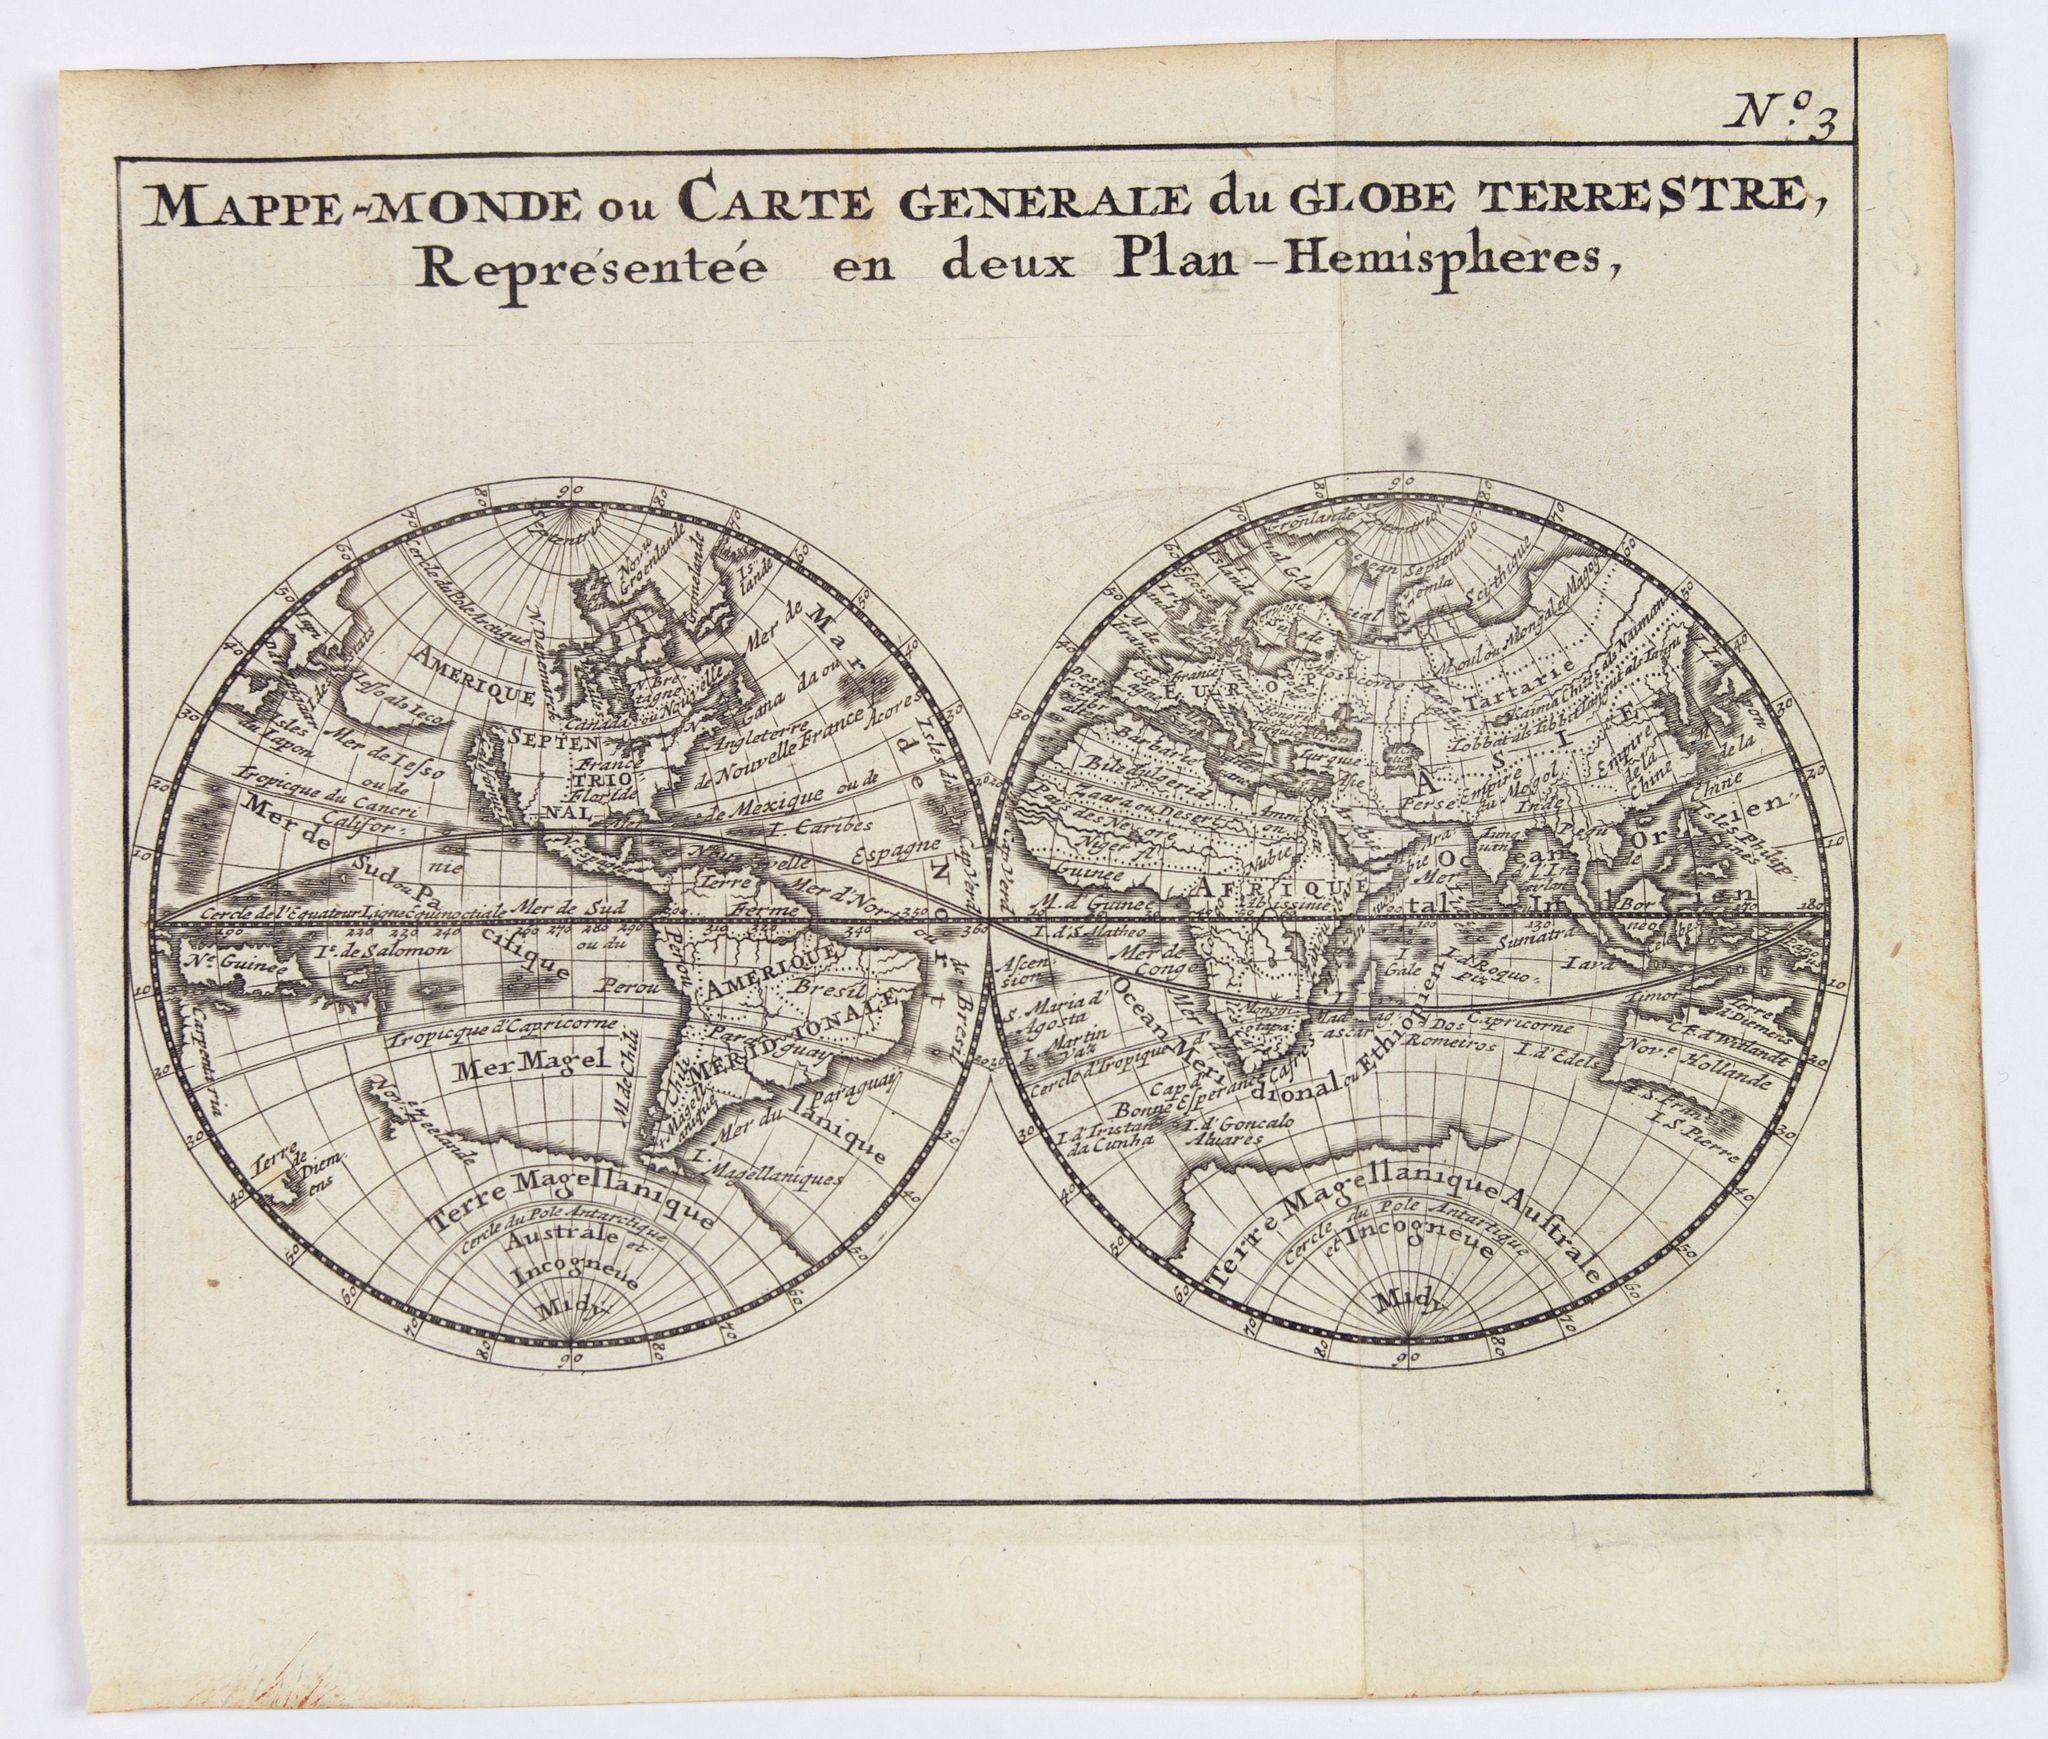 BOSSUET, Jacques Benigne. - Mappe-Monde ou Carte Generale du Globe Terrestre, Representee en deux Plan-Hemispheres.